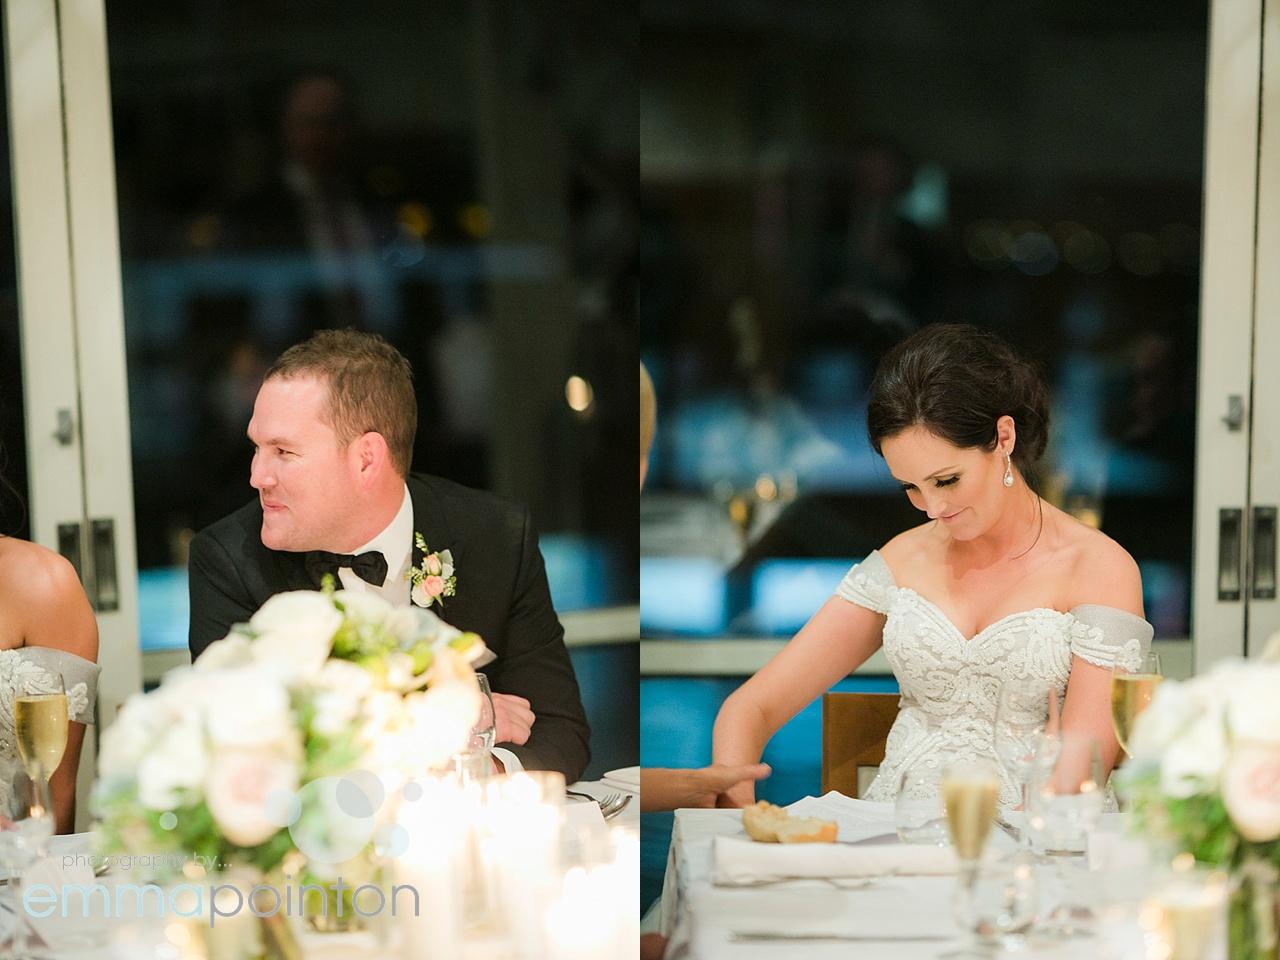 Perth Wedding Photography 086.jpg